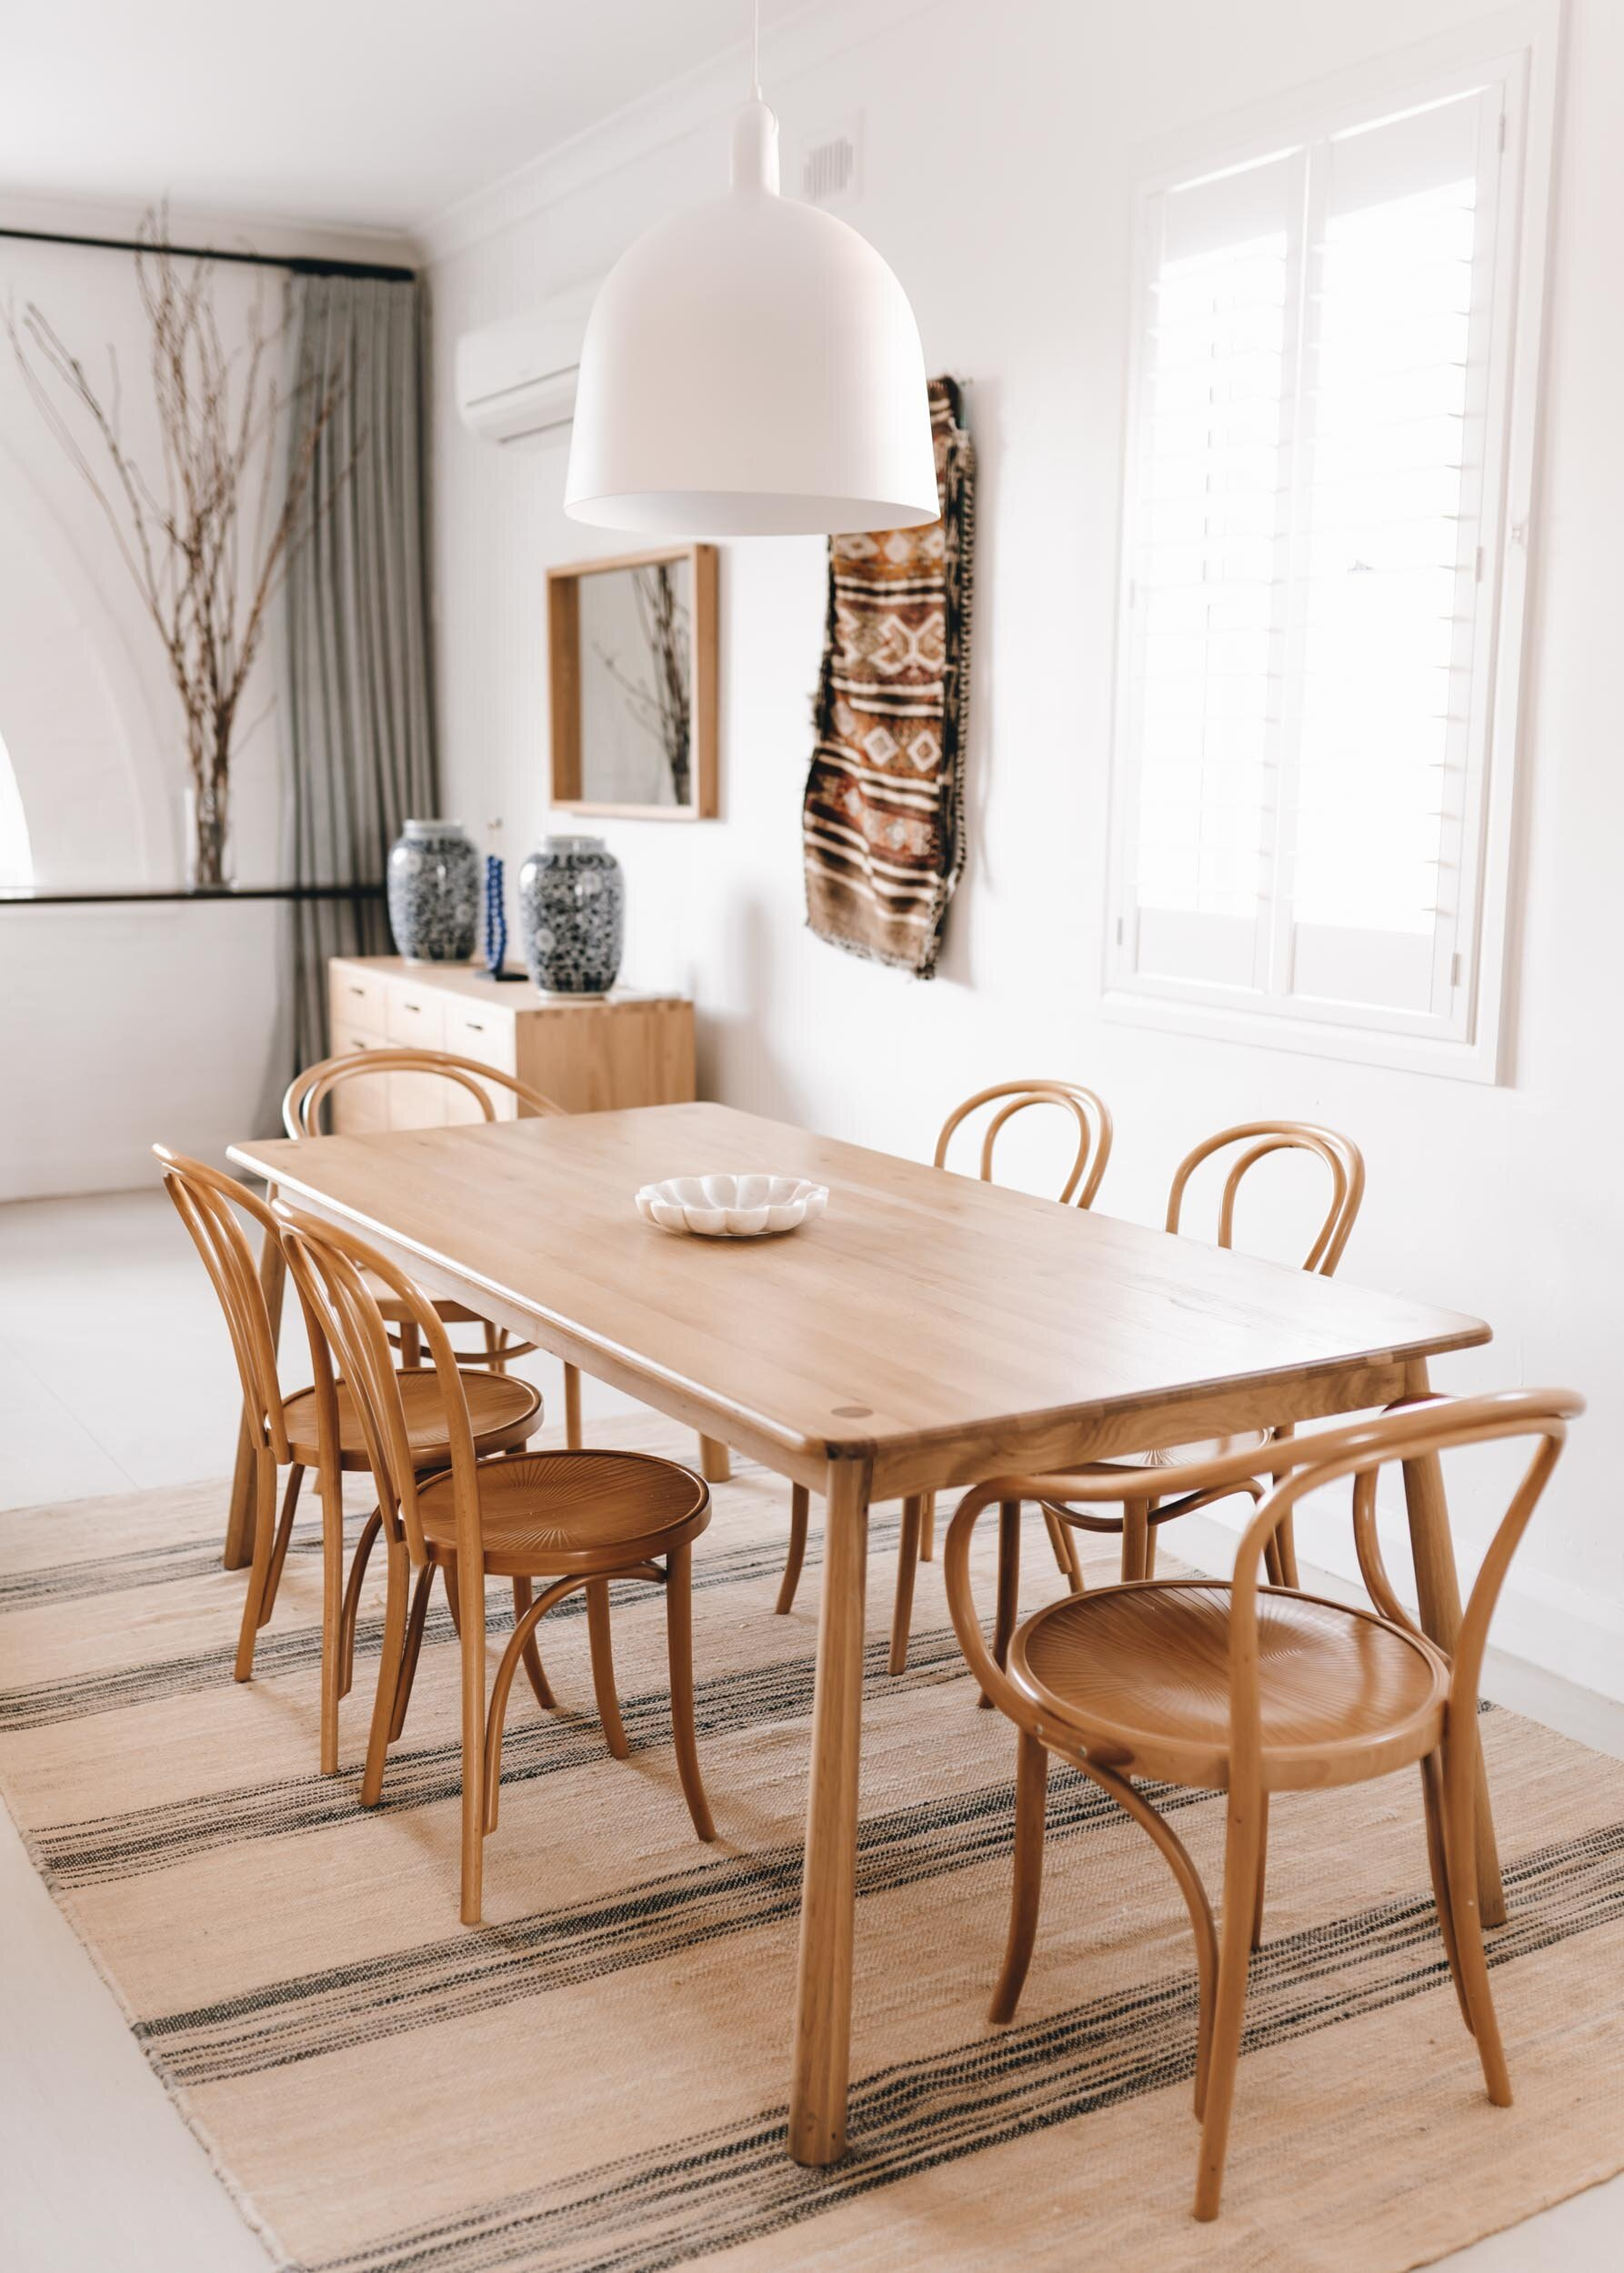 keira-mason-flourish-on-bull-street-dining-table.jpg